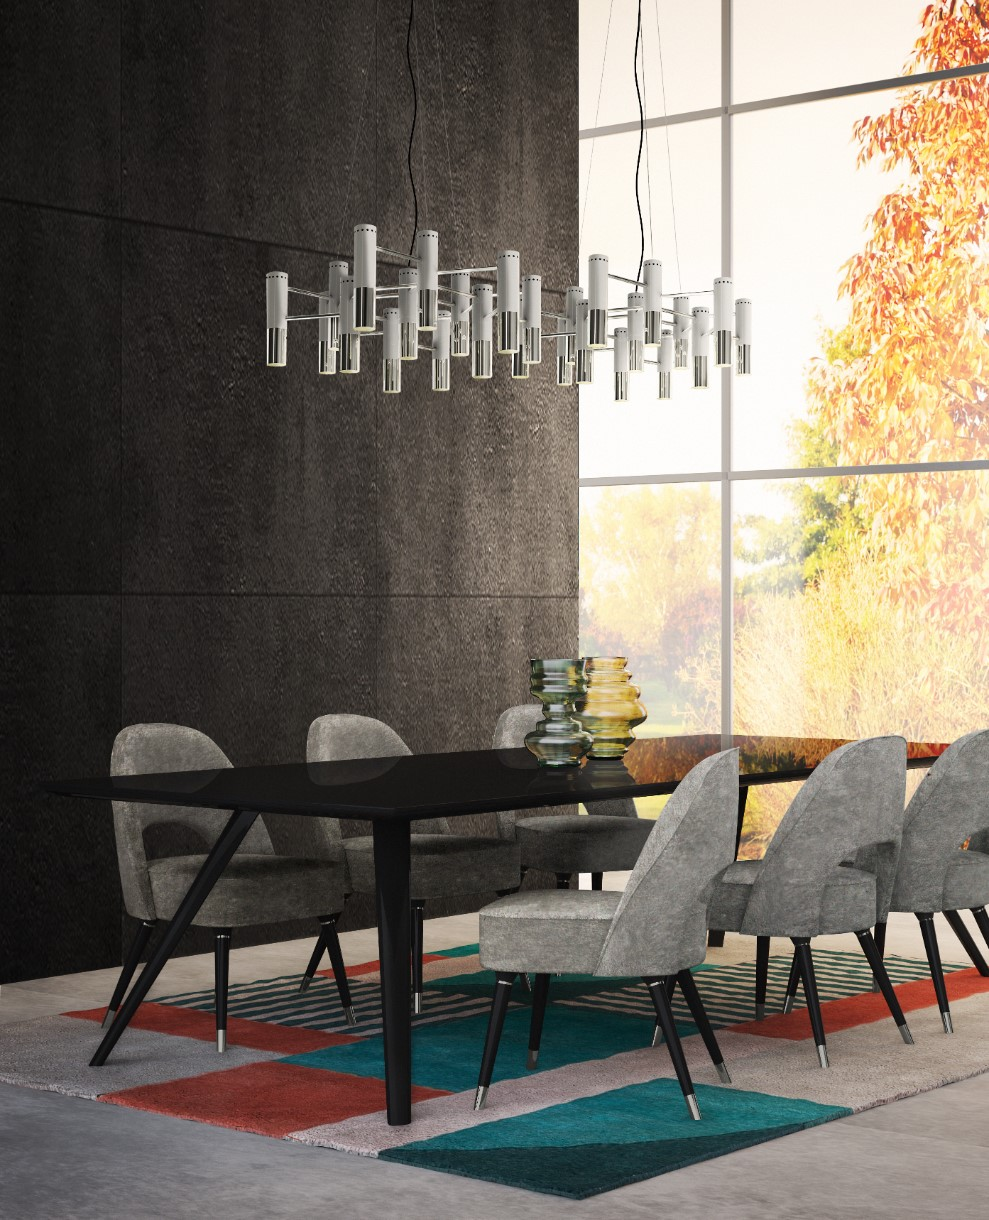 🍽️ Redecorate Your Dining Room Following Carlo Donati's Design Rules! carlo donati 🍽️ Redecorate Your Dining Room Following Carlo Donati's Design Rules! 3 16